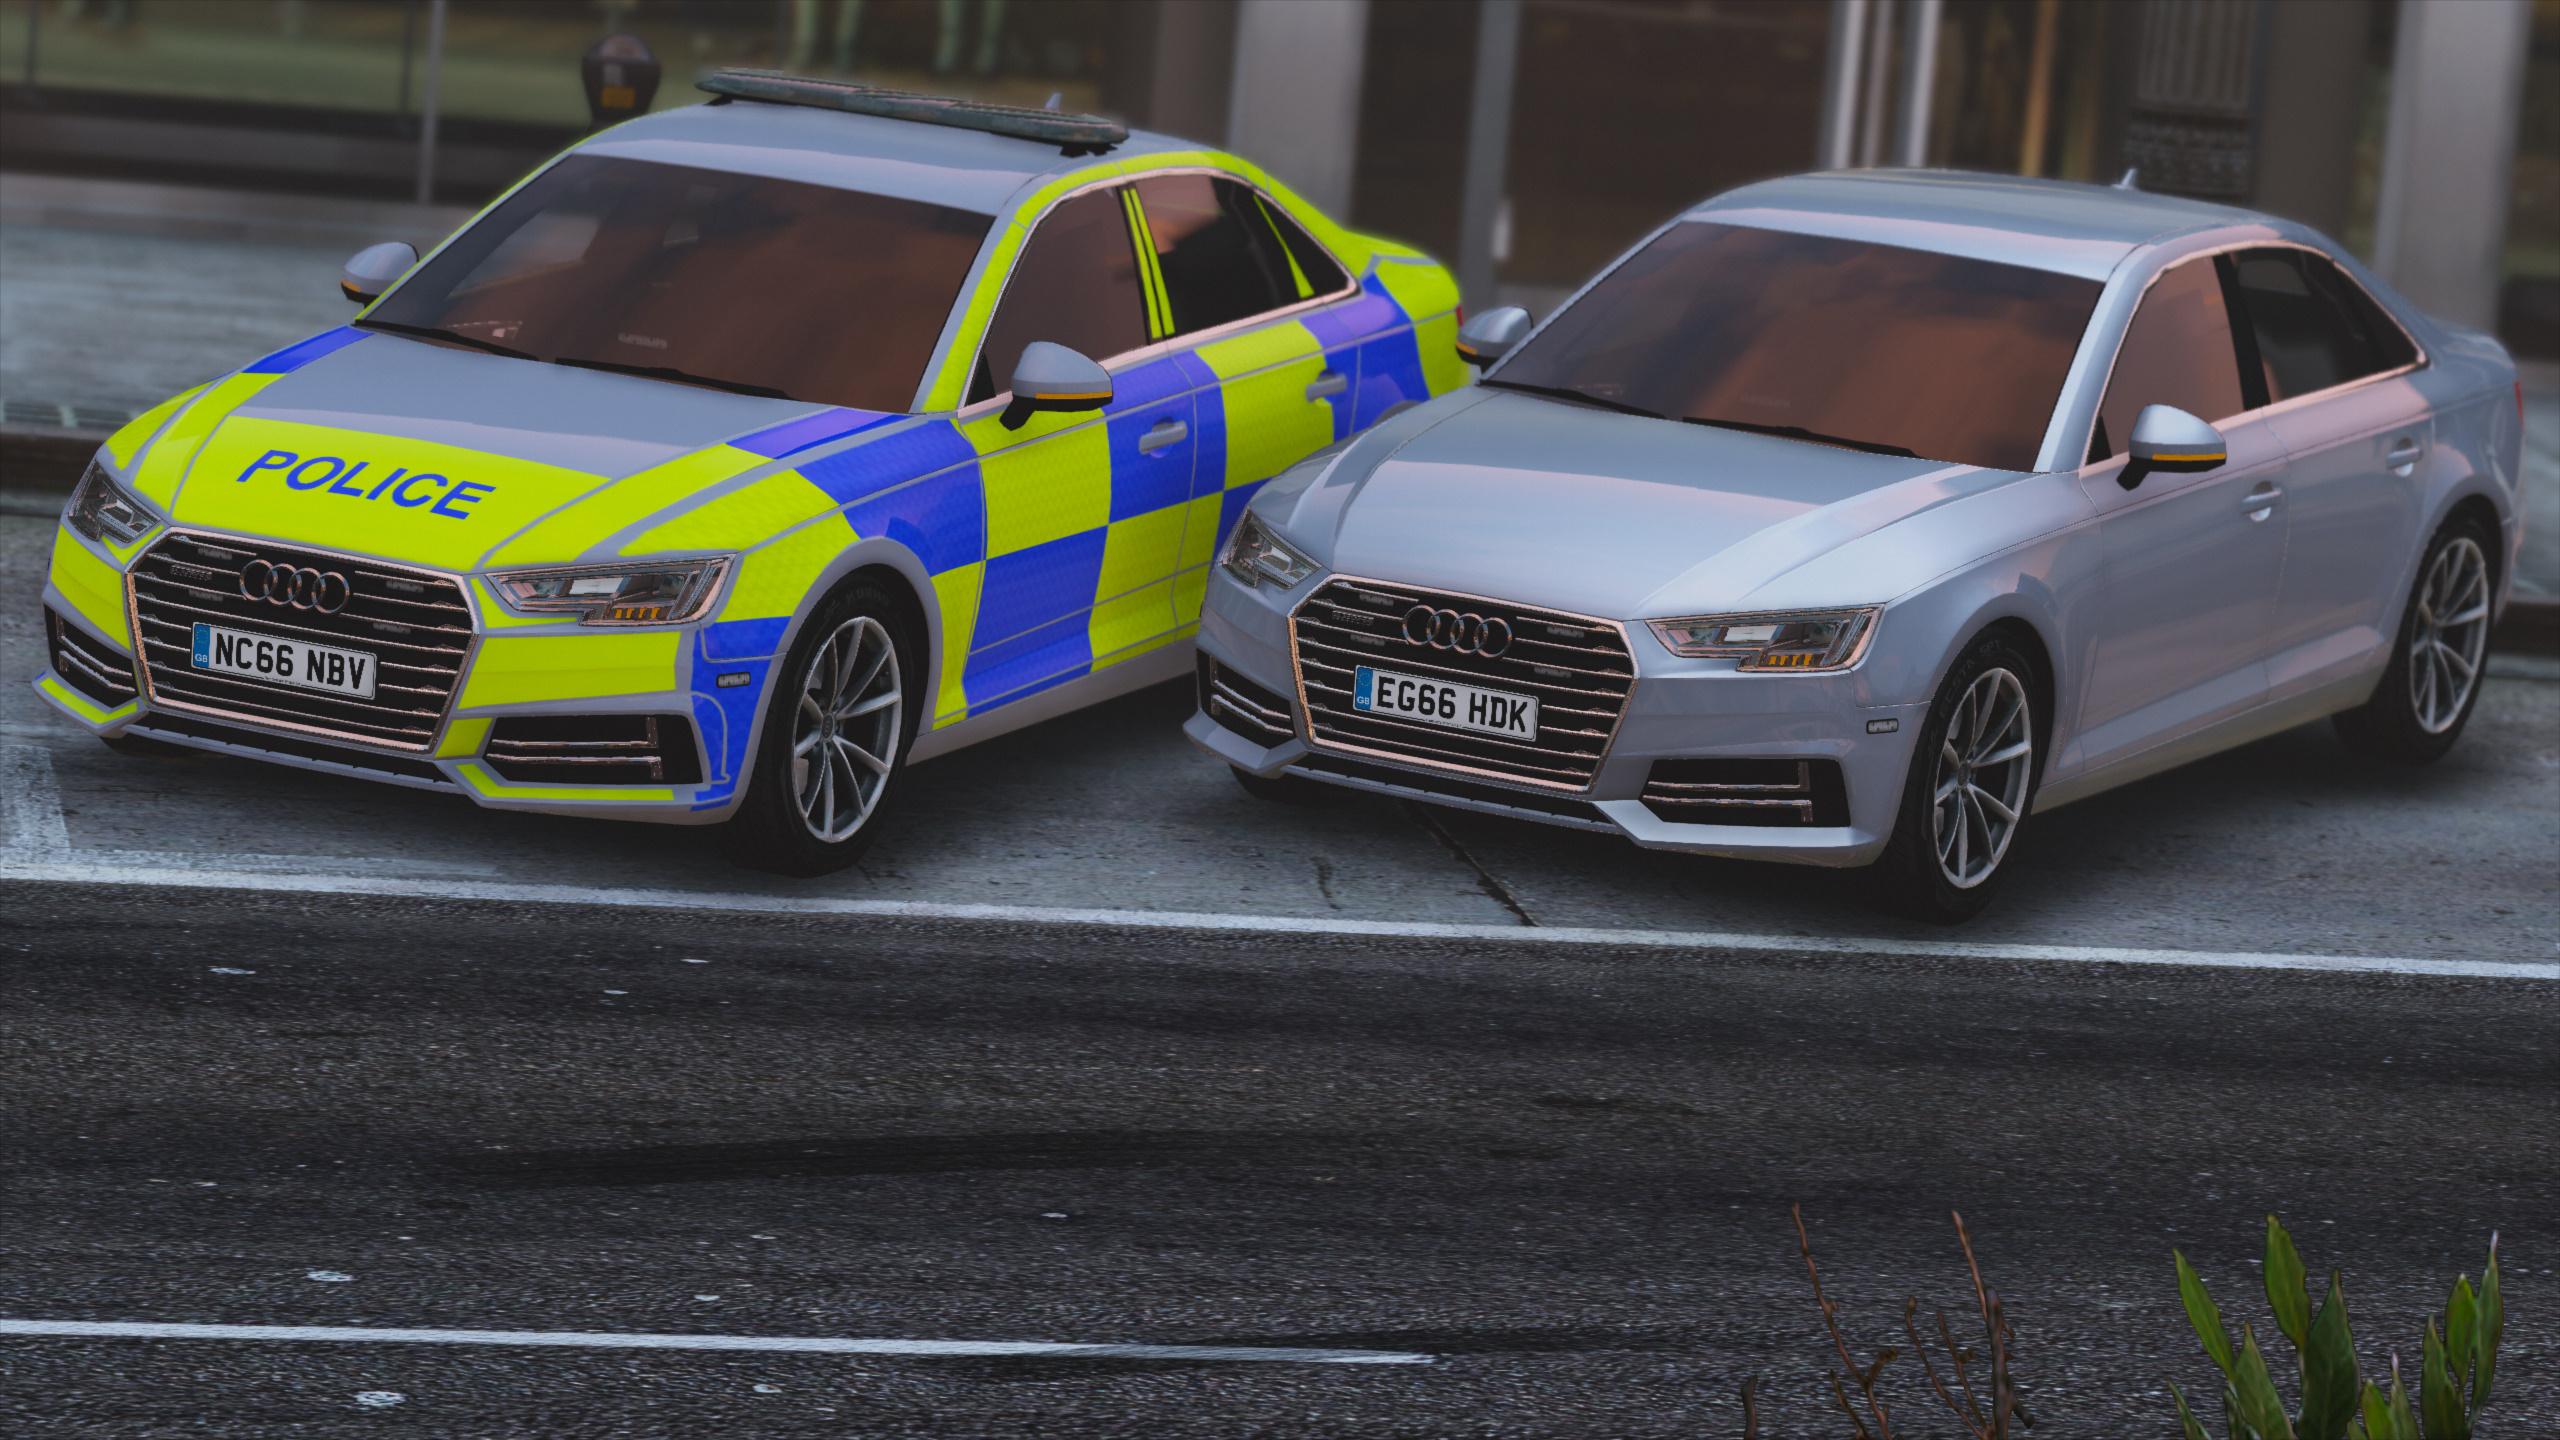 Police Audi A Pack ELS GTAModscom - Audi car gta 5